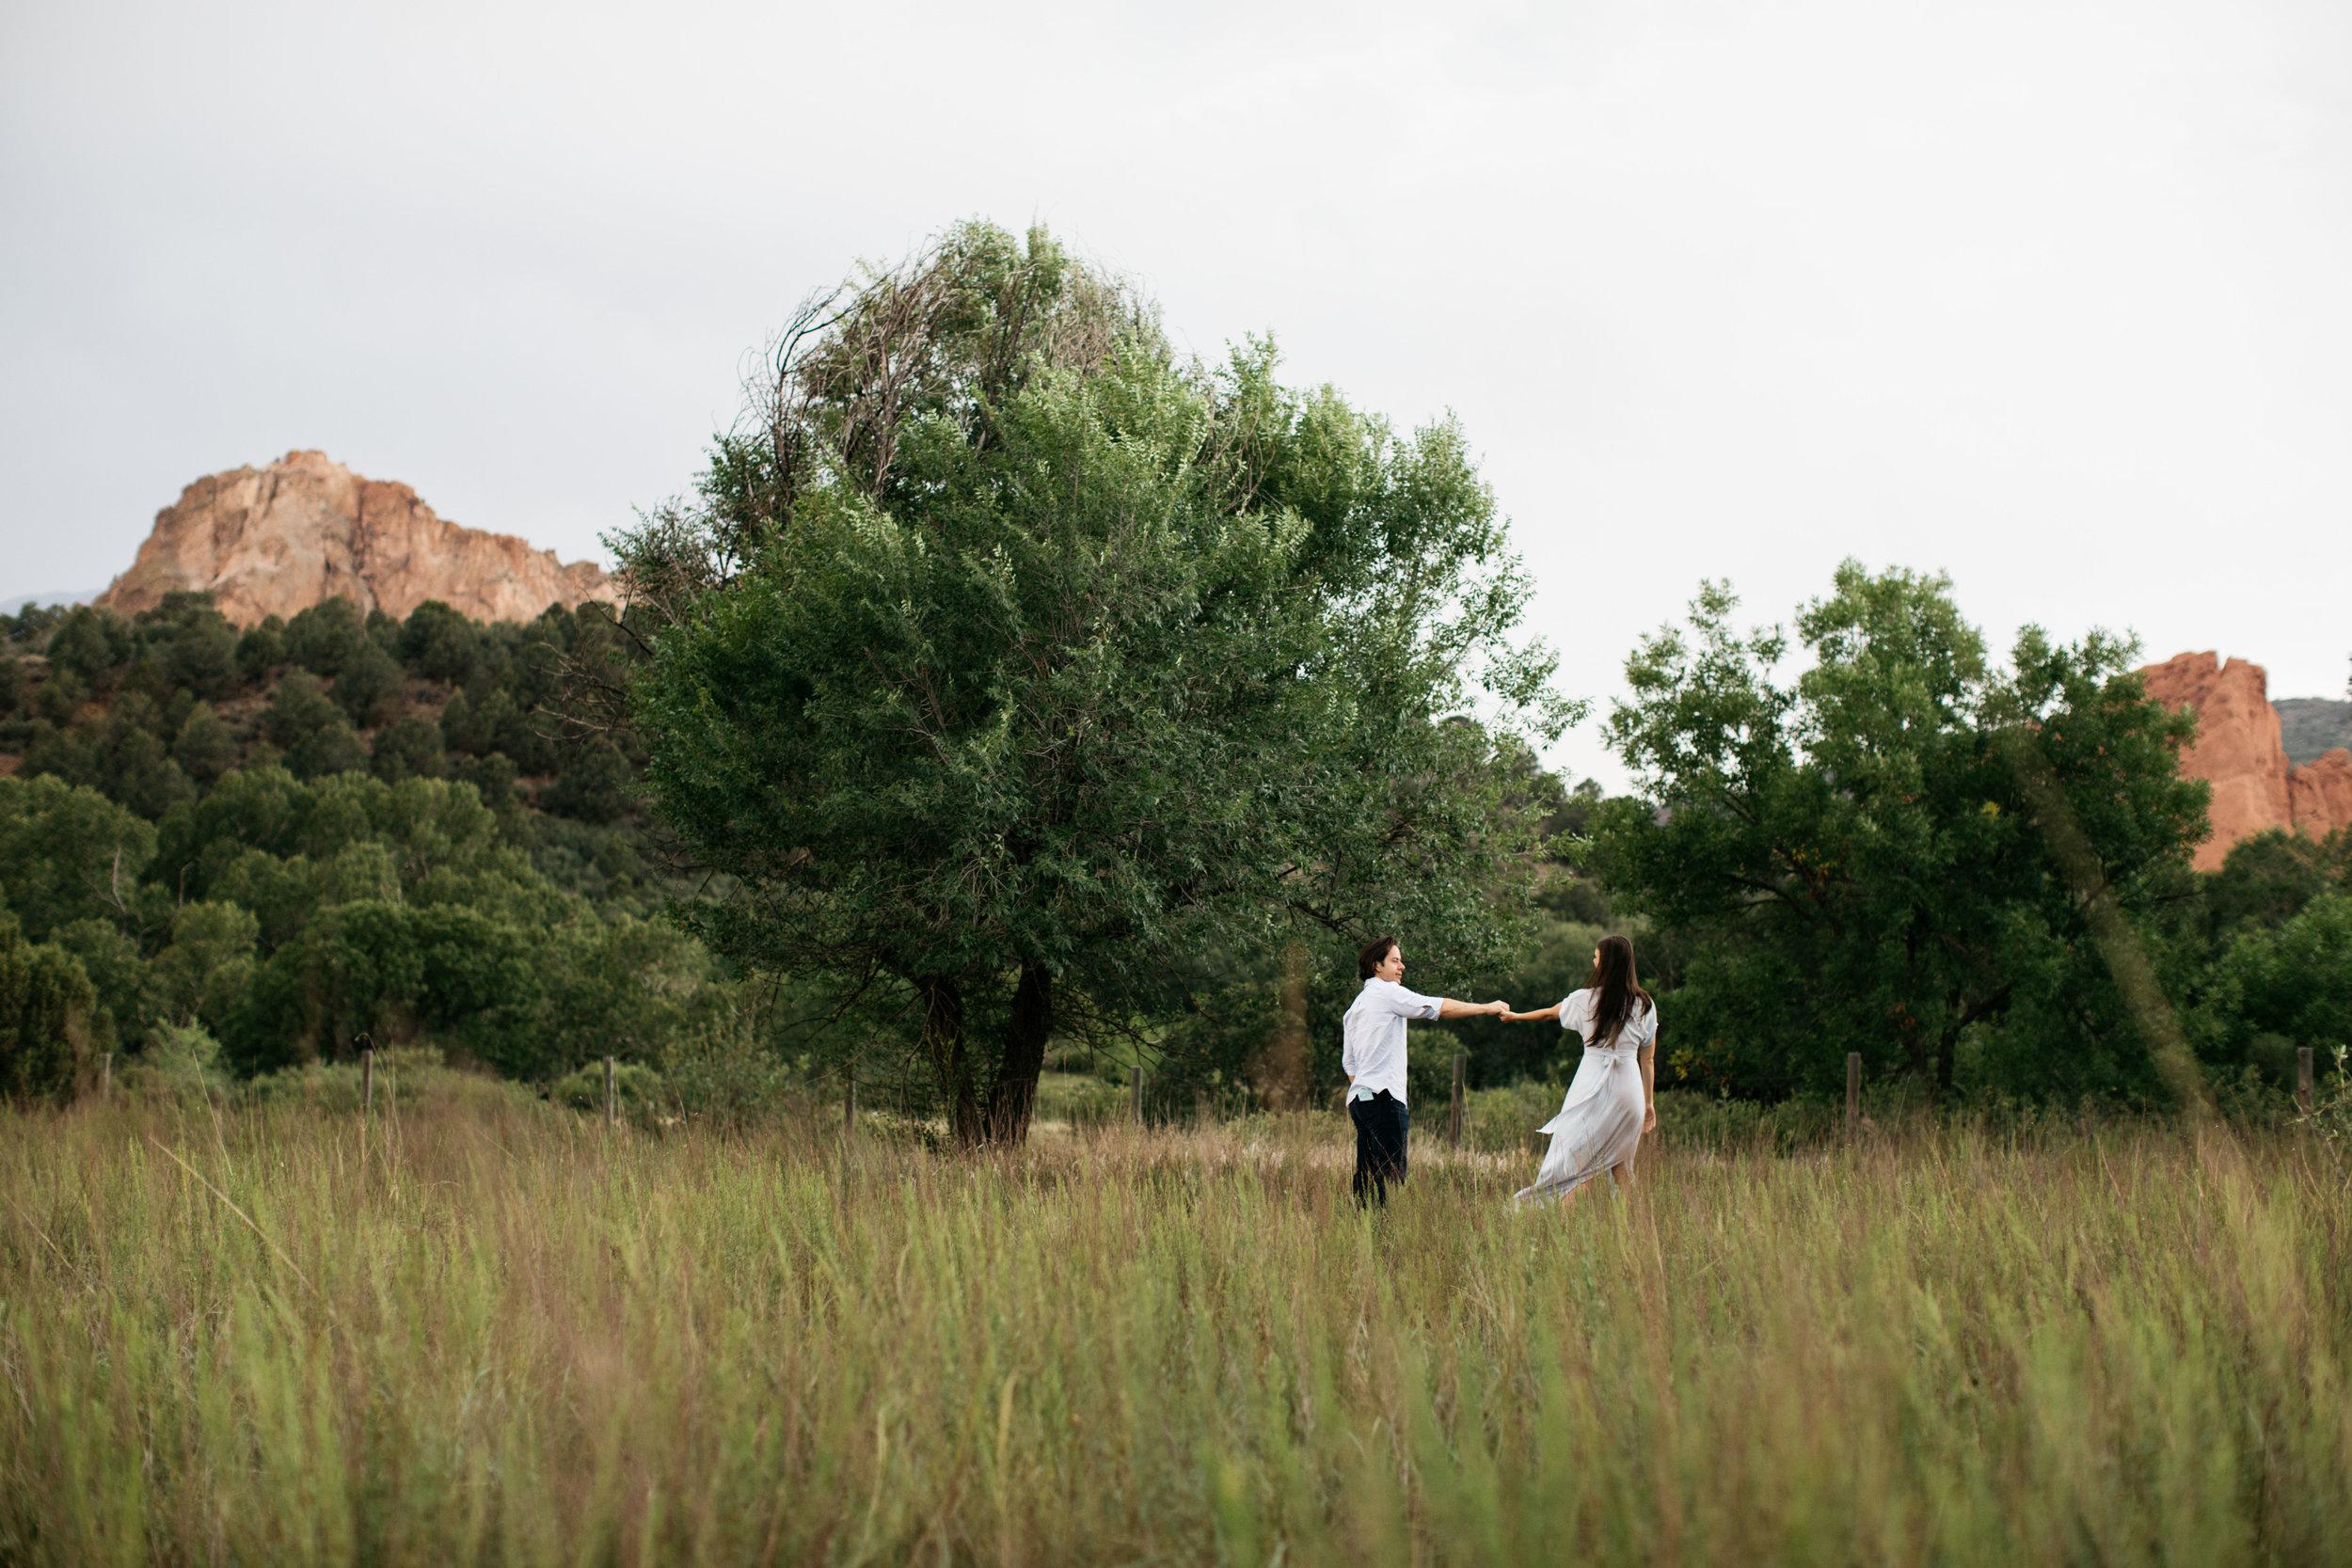 broadmoor-engagement-photography-110.jpg